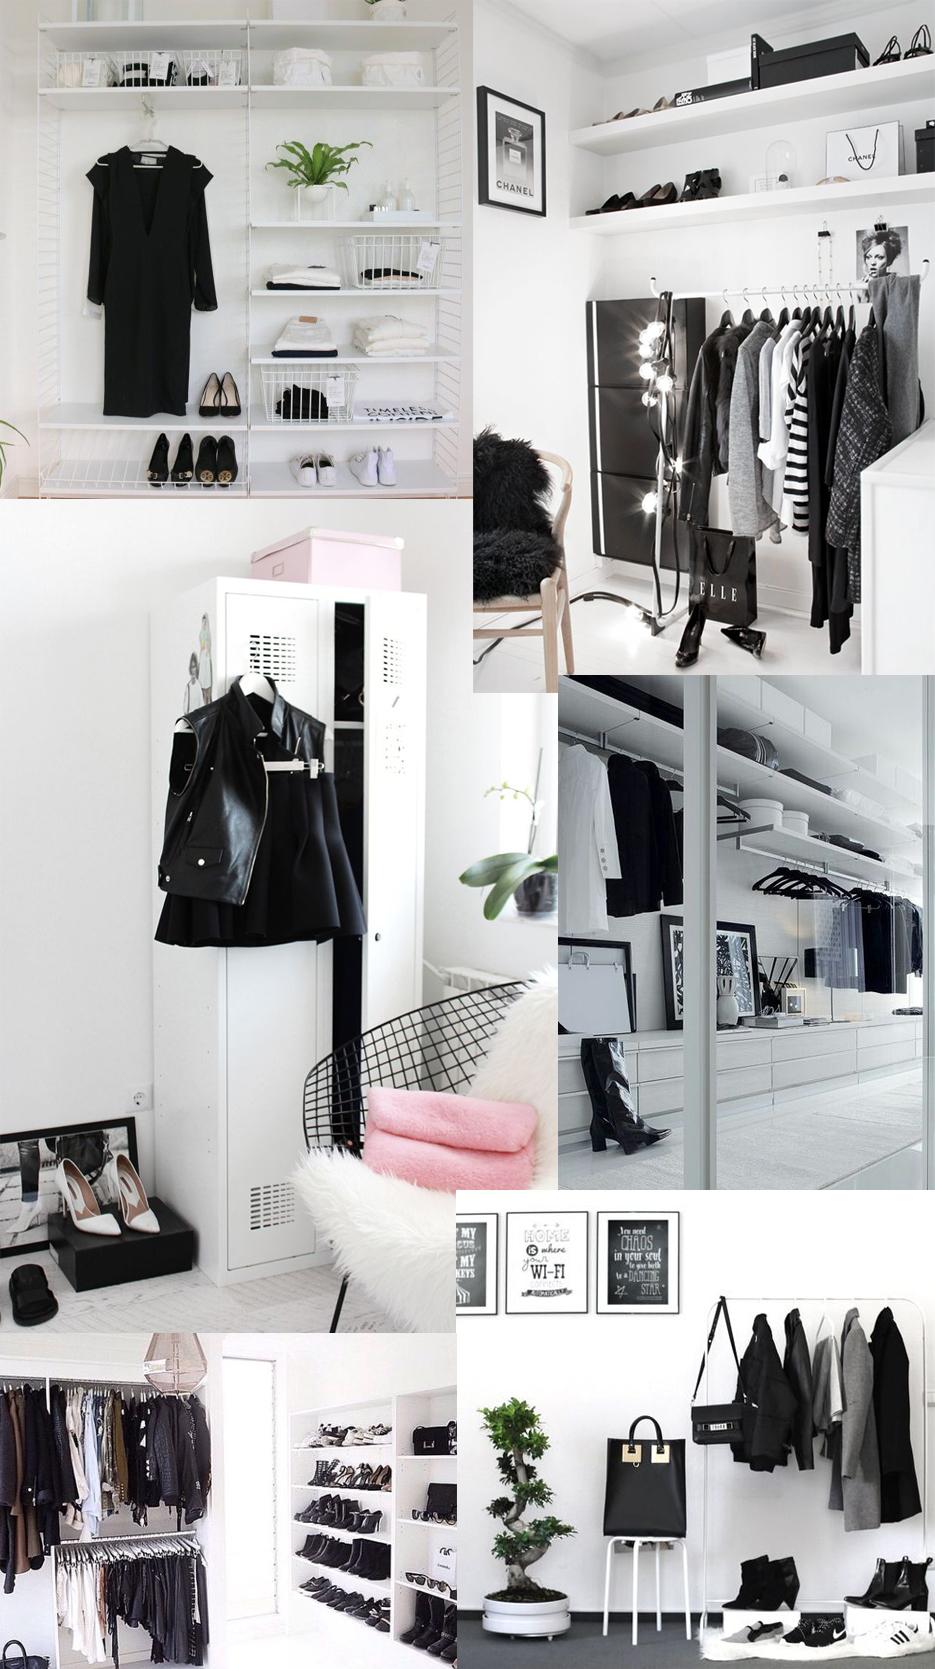 POSE-nyc-closet-6